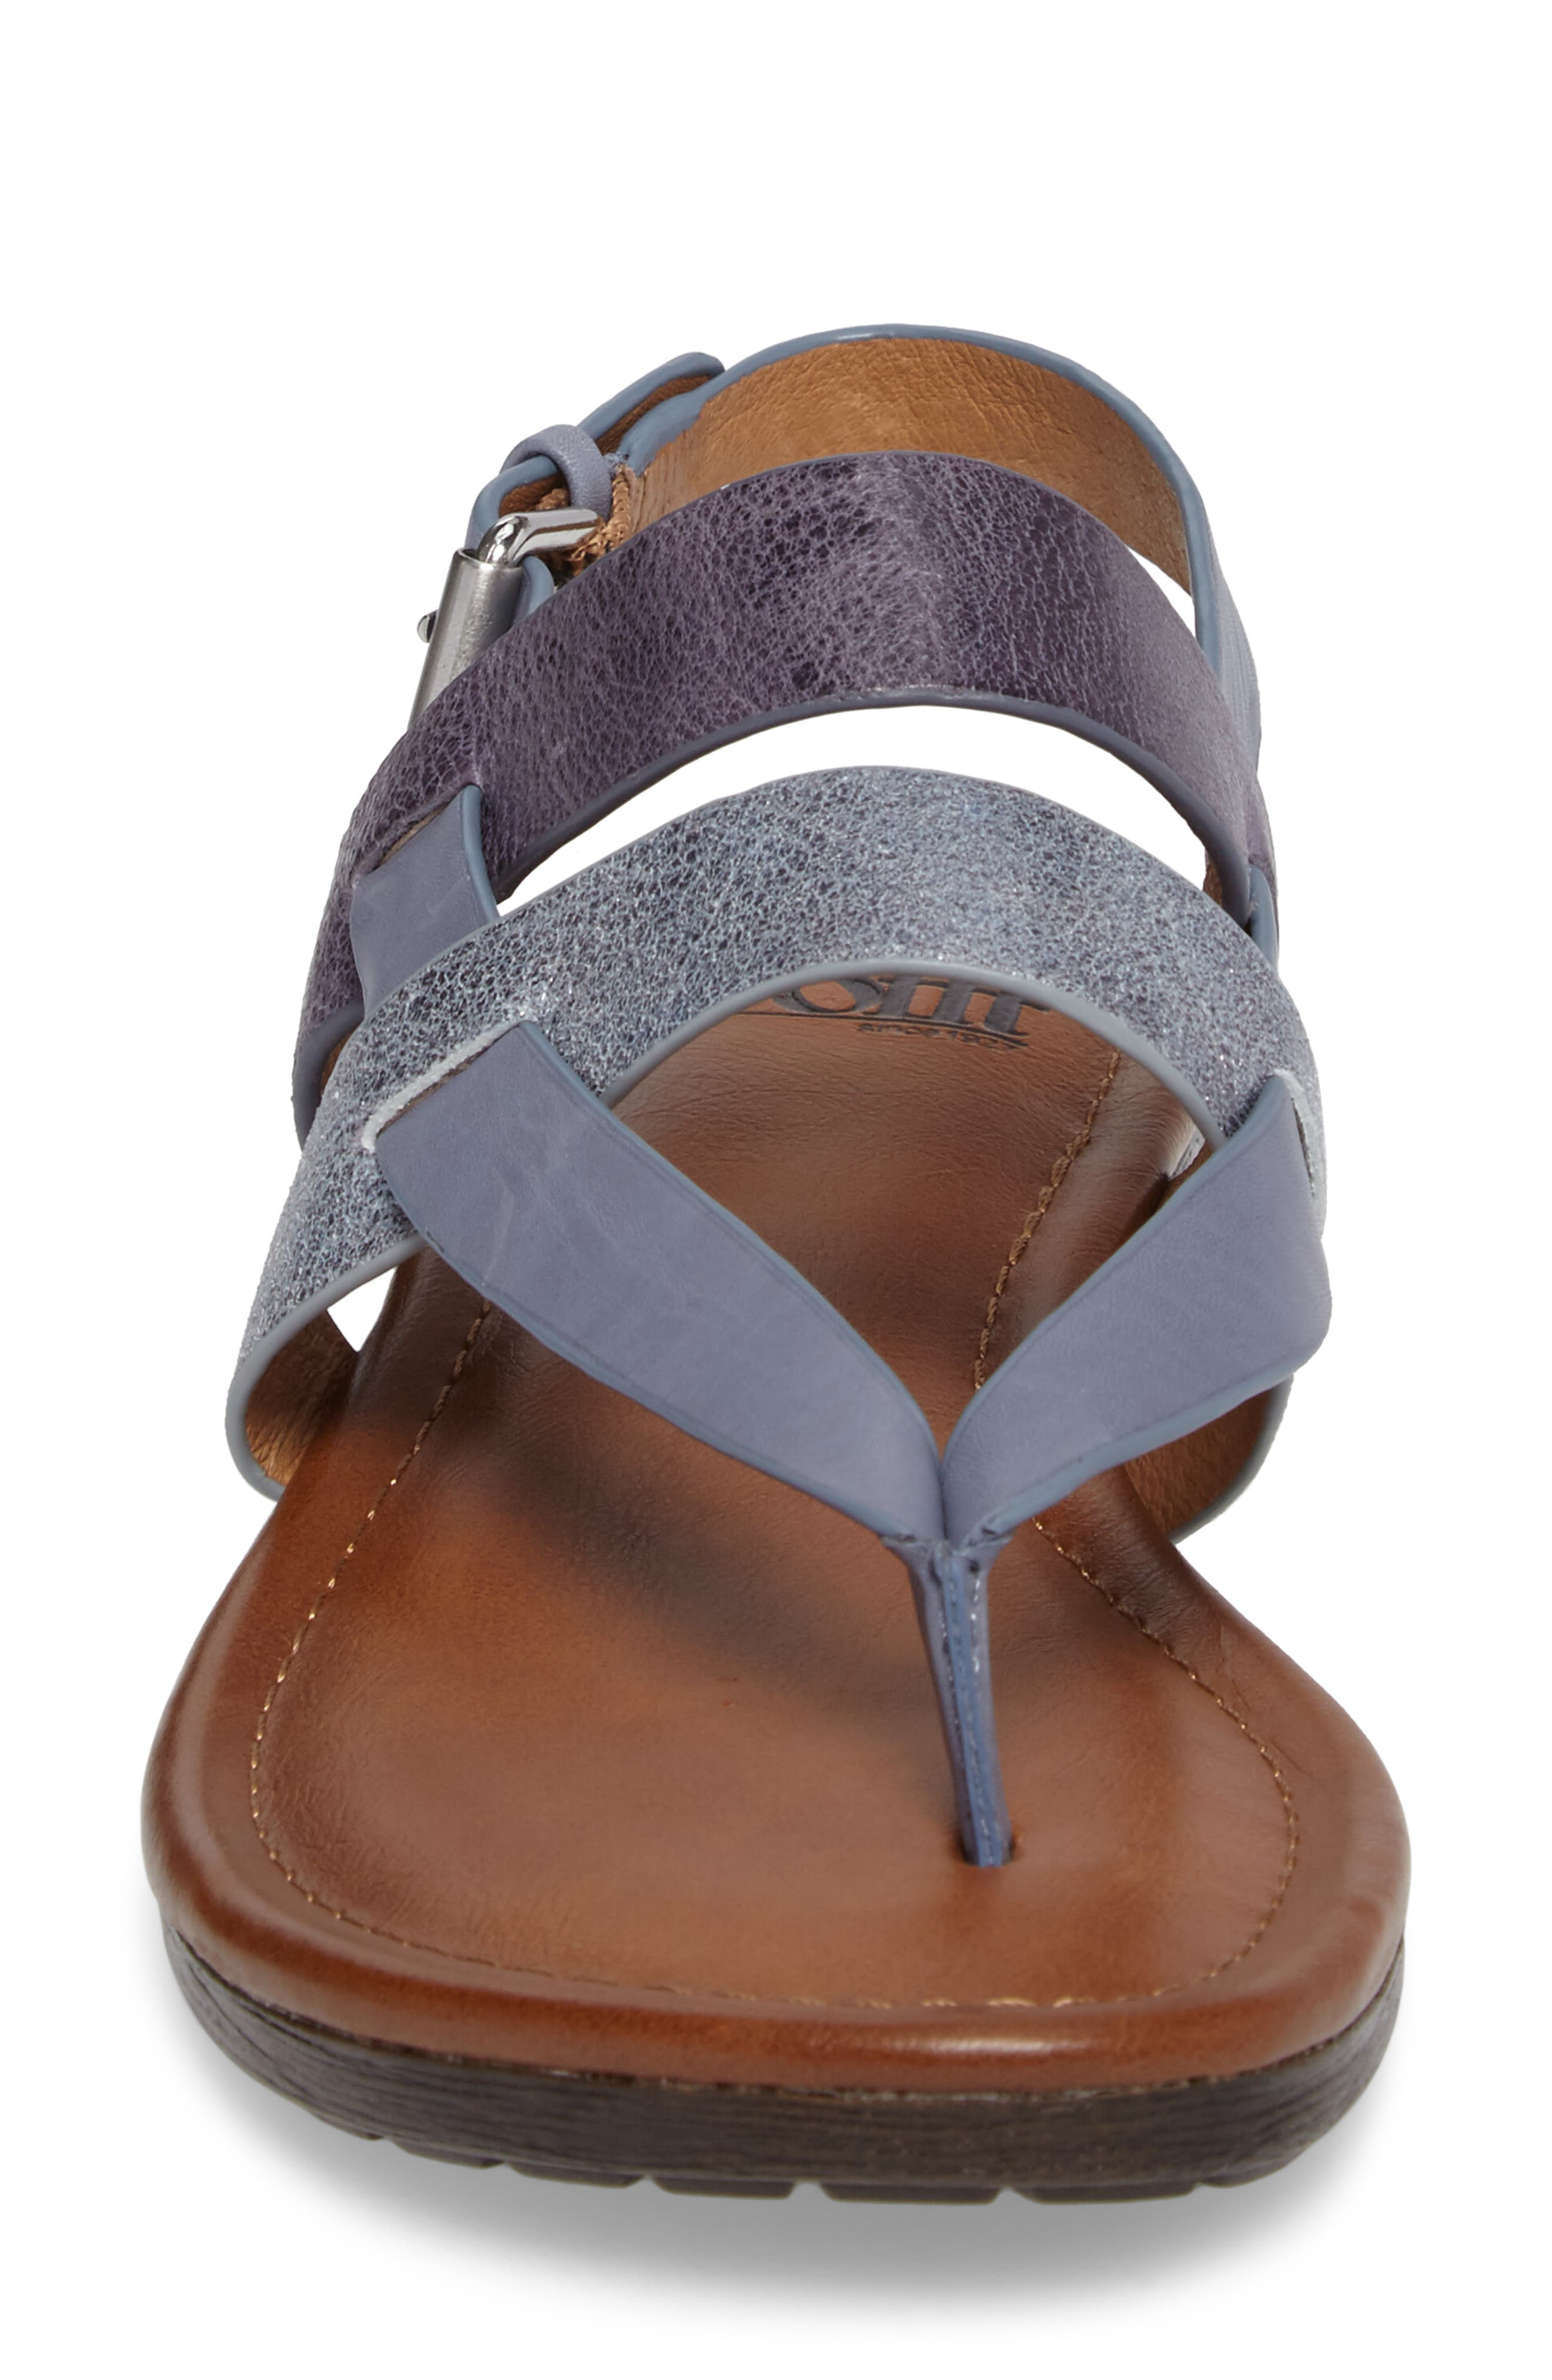 Bena Strappy Sandal,                             Alternate thumbnail 4, color,                             Denim/ Blue/ Pale Blue Leather